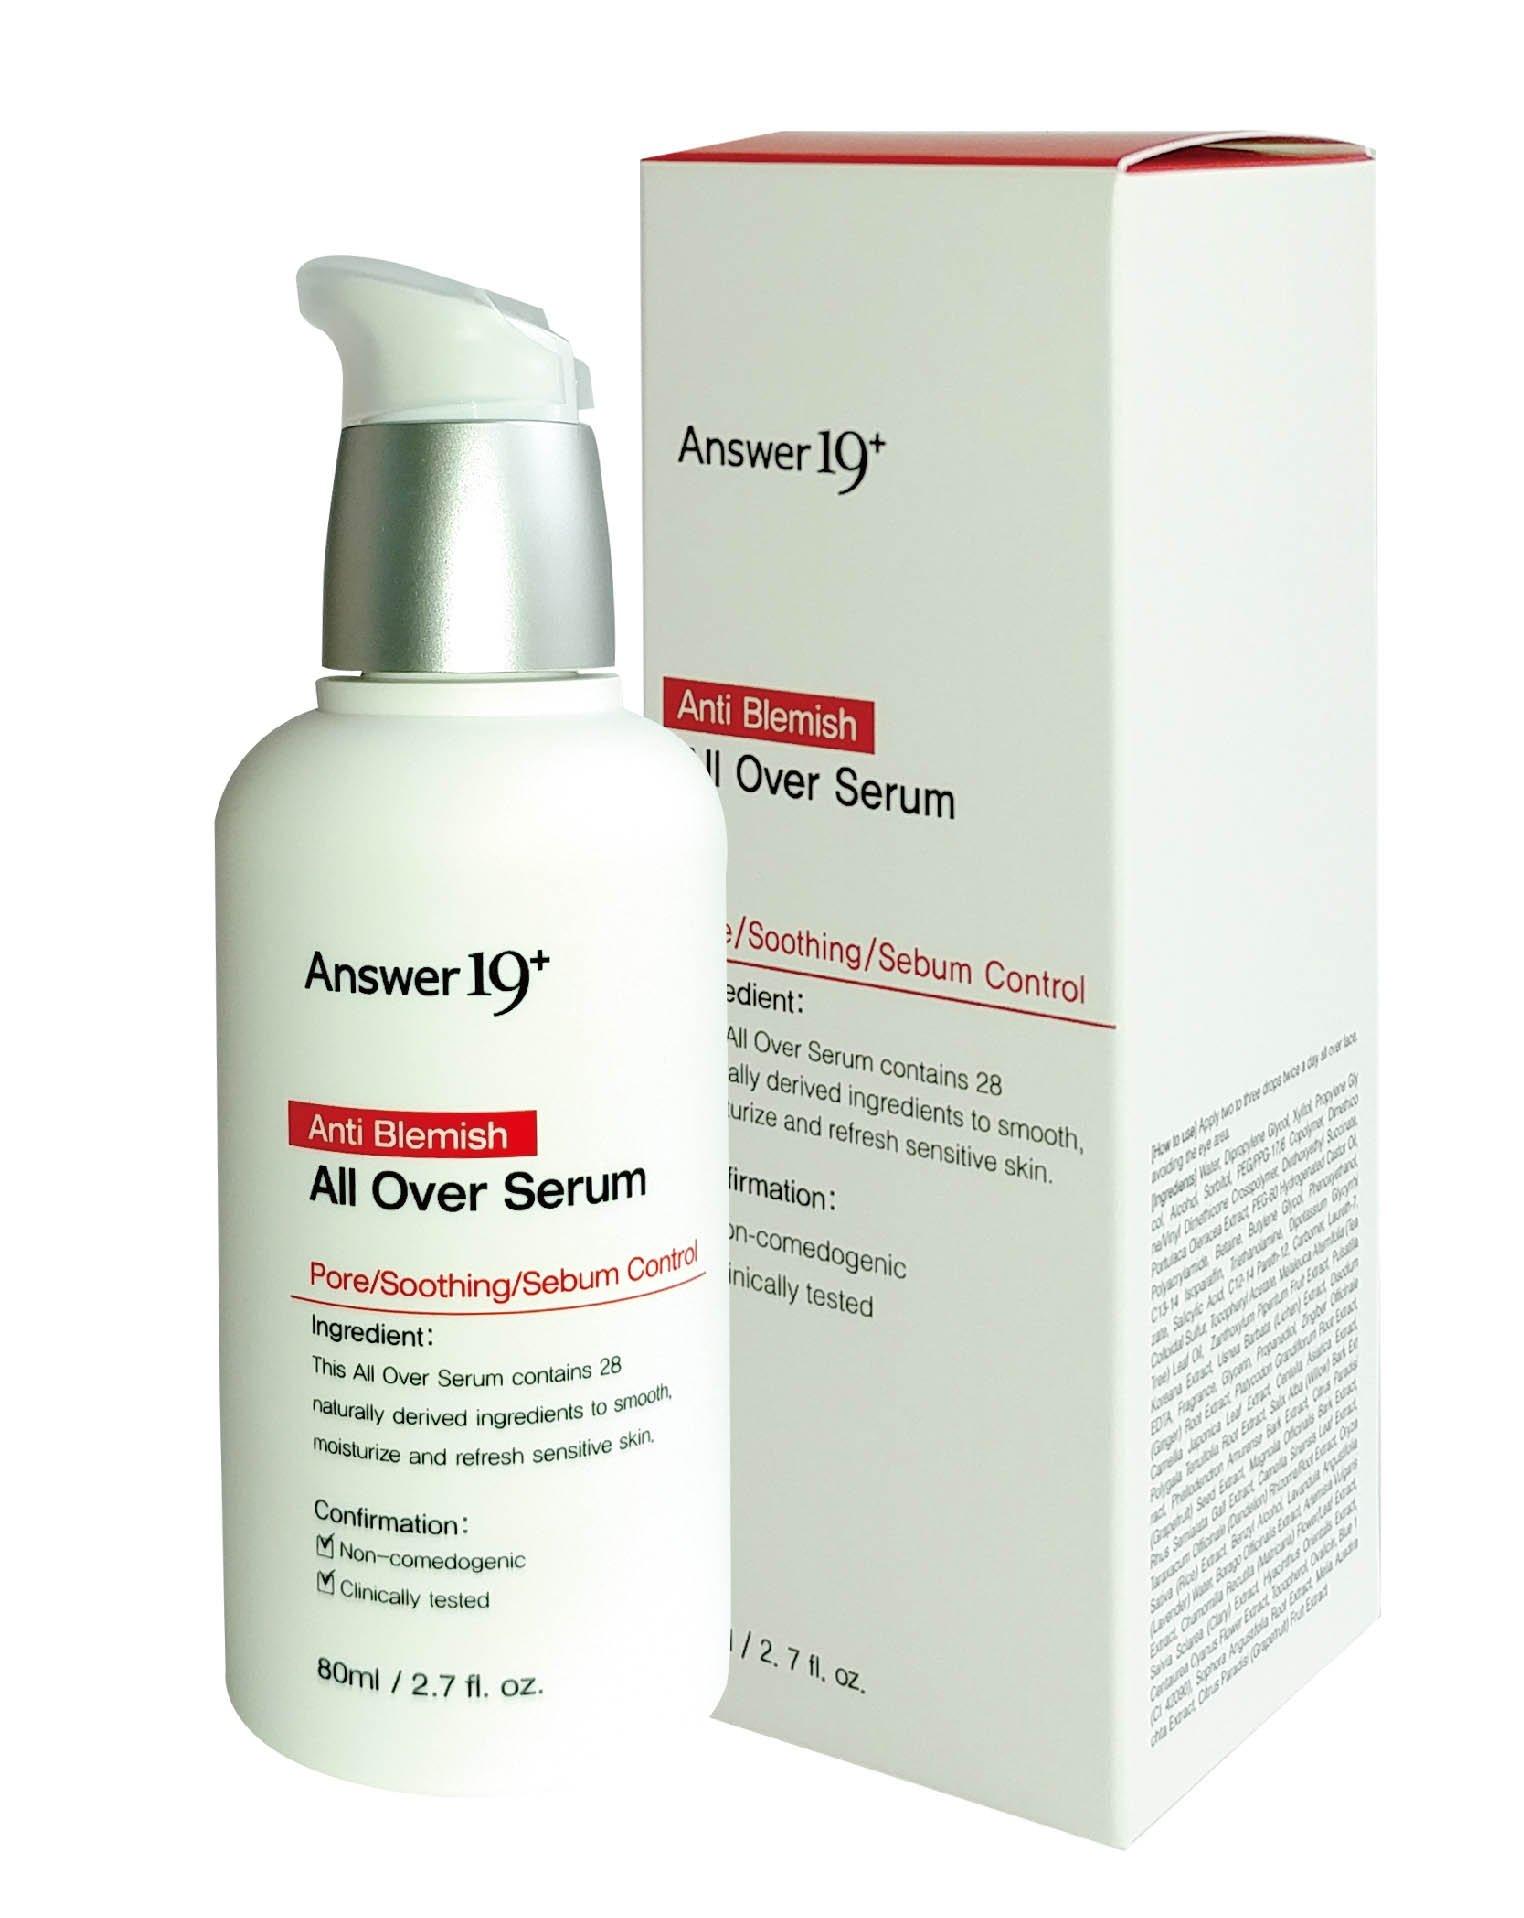 Answer Nineteen Anti Blemish Purifying Toner Rdl Pharmaceutical Alkohol Baby Face Original All Over Serum Minimize Skin Irritation With Ecocert Certified